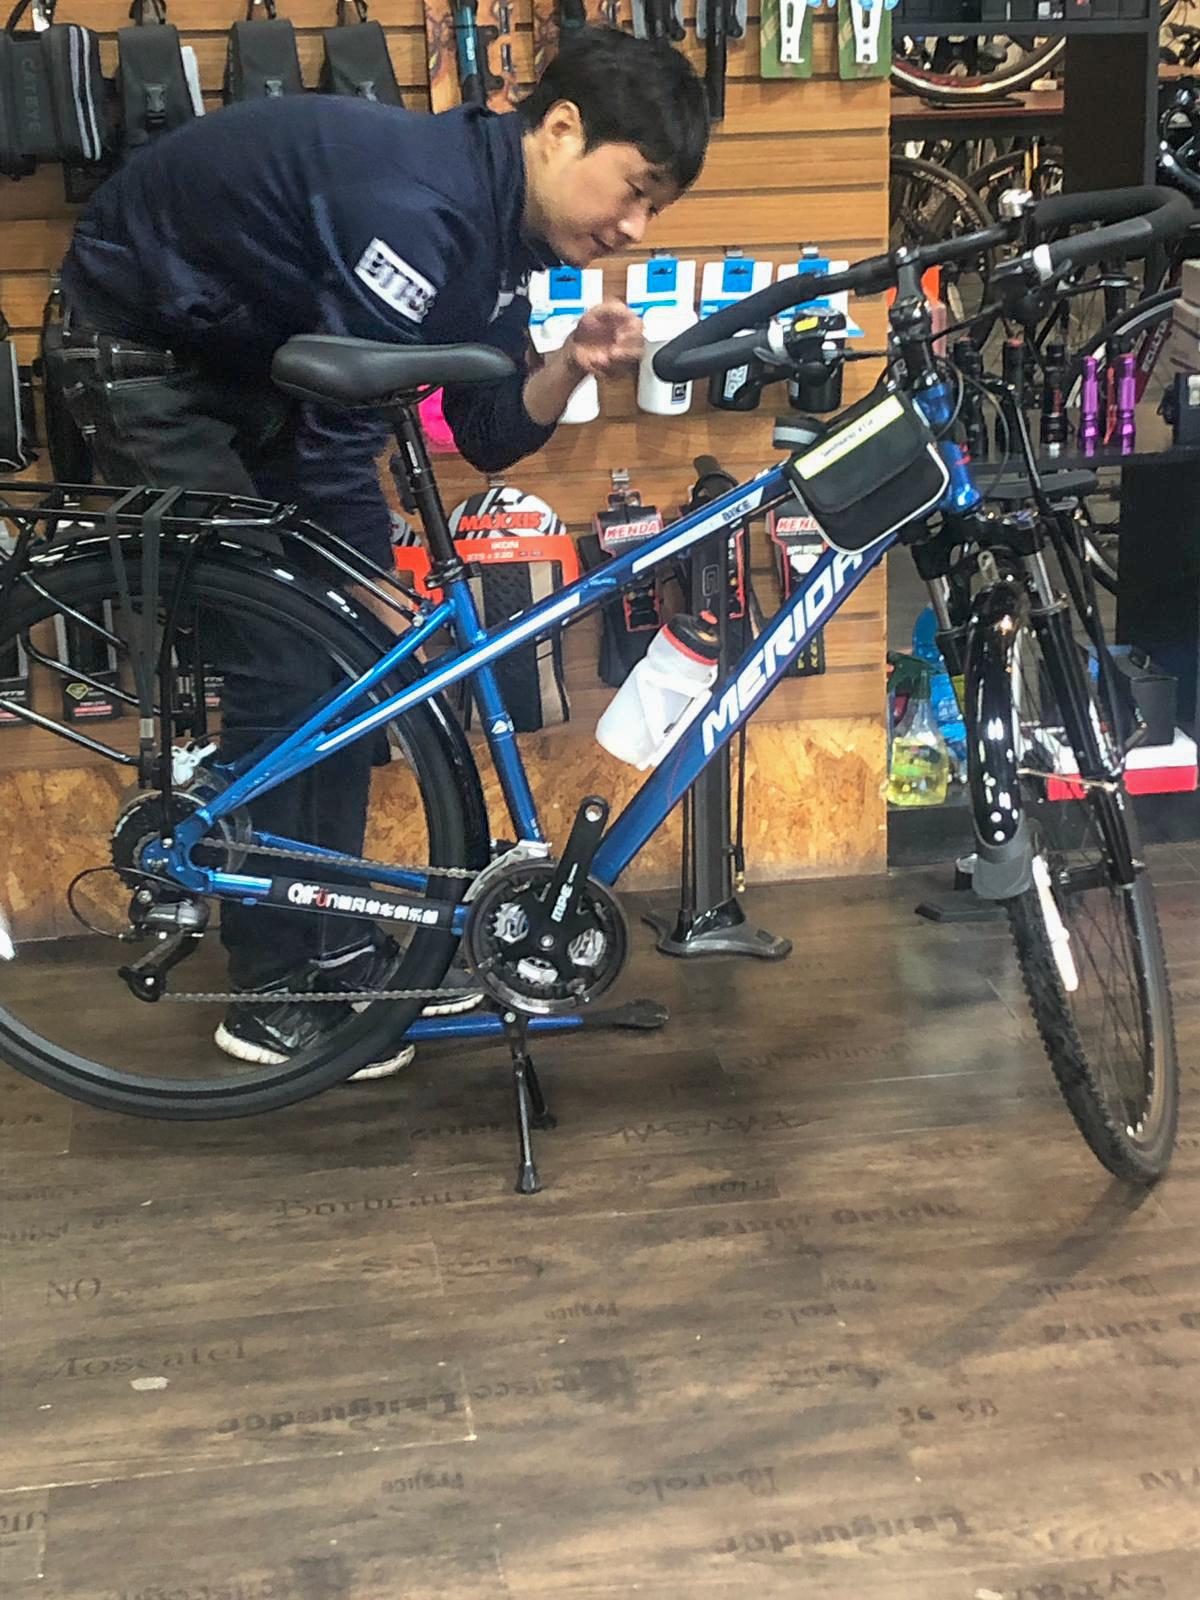 A bike for Rylan?